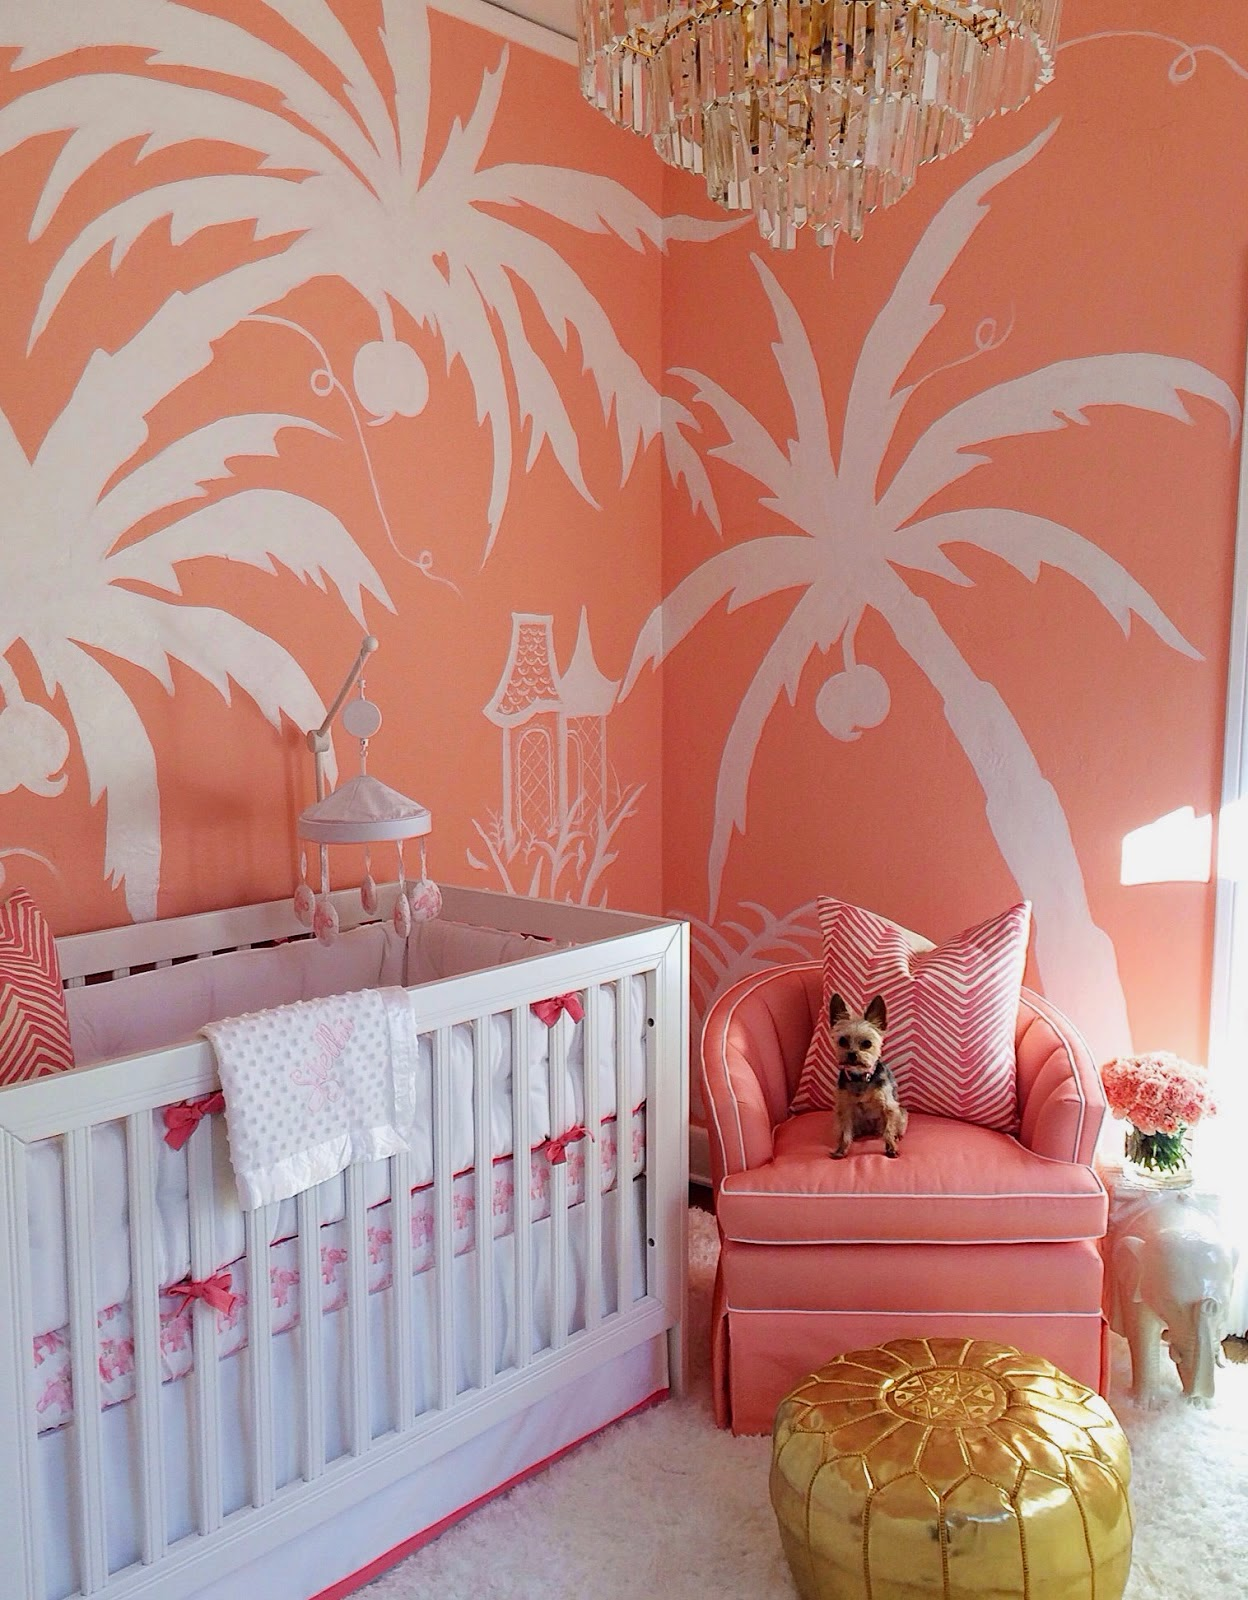 palm-beach-chic-hollywood-regency-glamorous-elegant-chinoiserie-pink-nursery